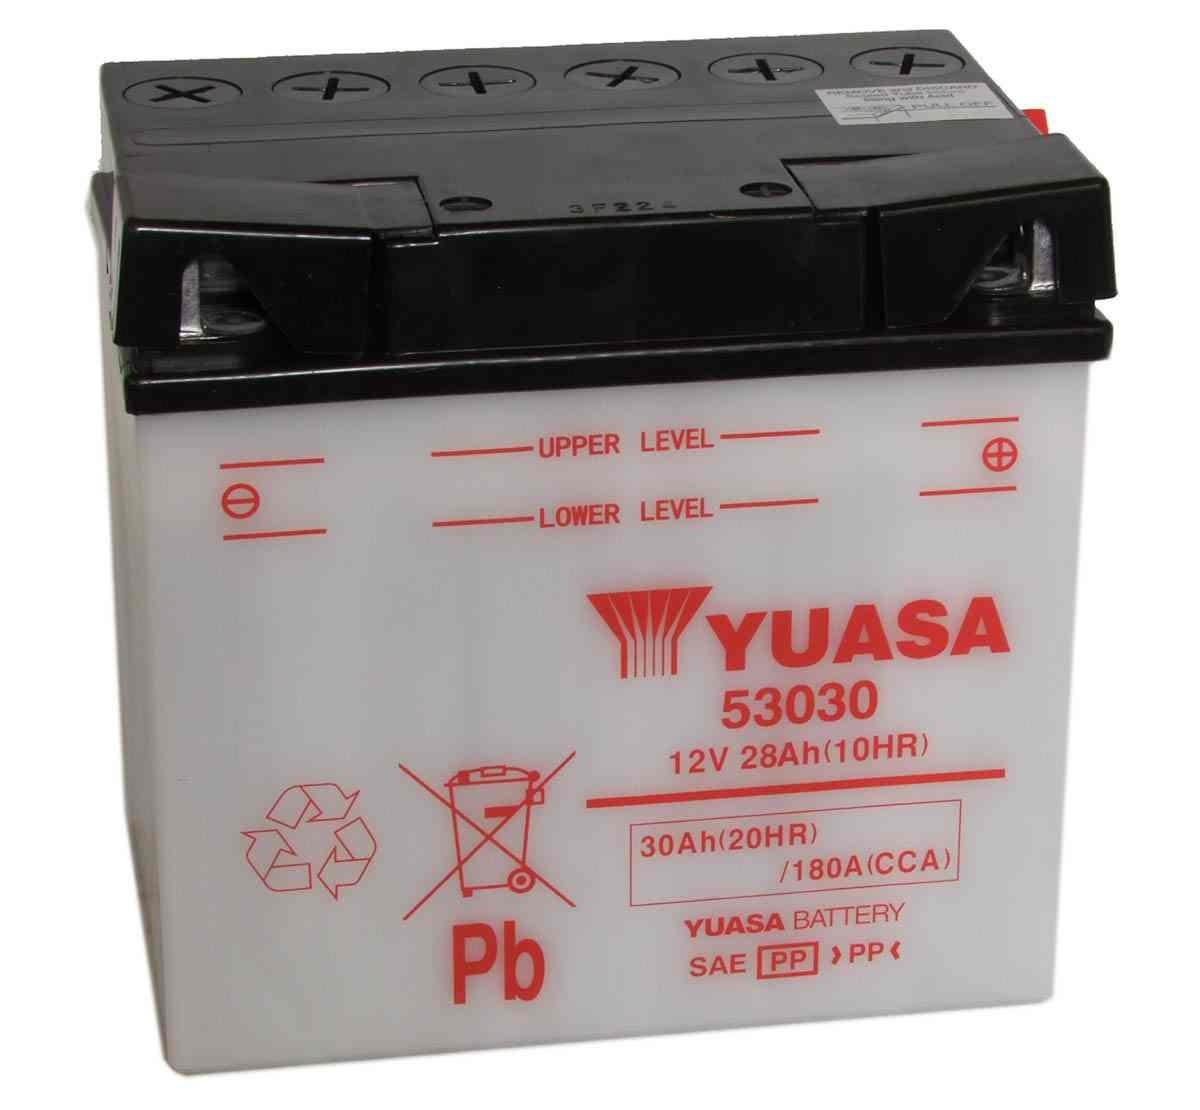 Bateria para moto o ciclomotor marca YUASA modelo 53030 de 12v 30Ah